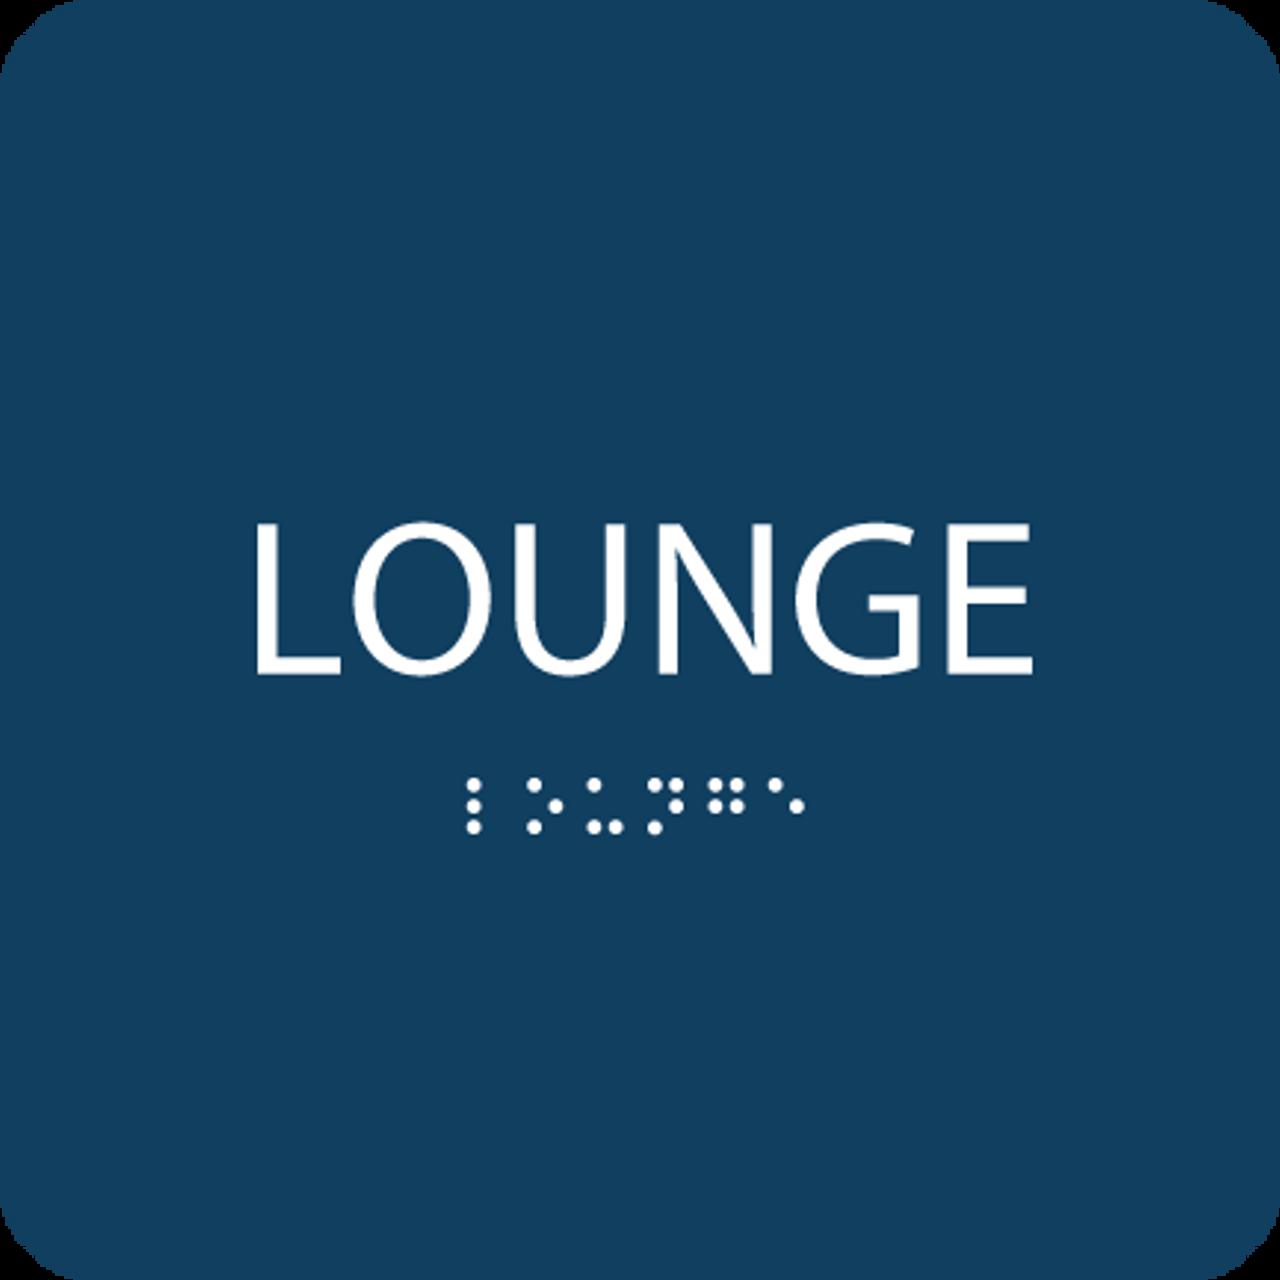 Blue Lounge Tactile Sign